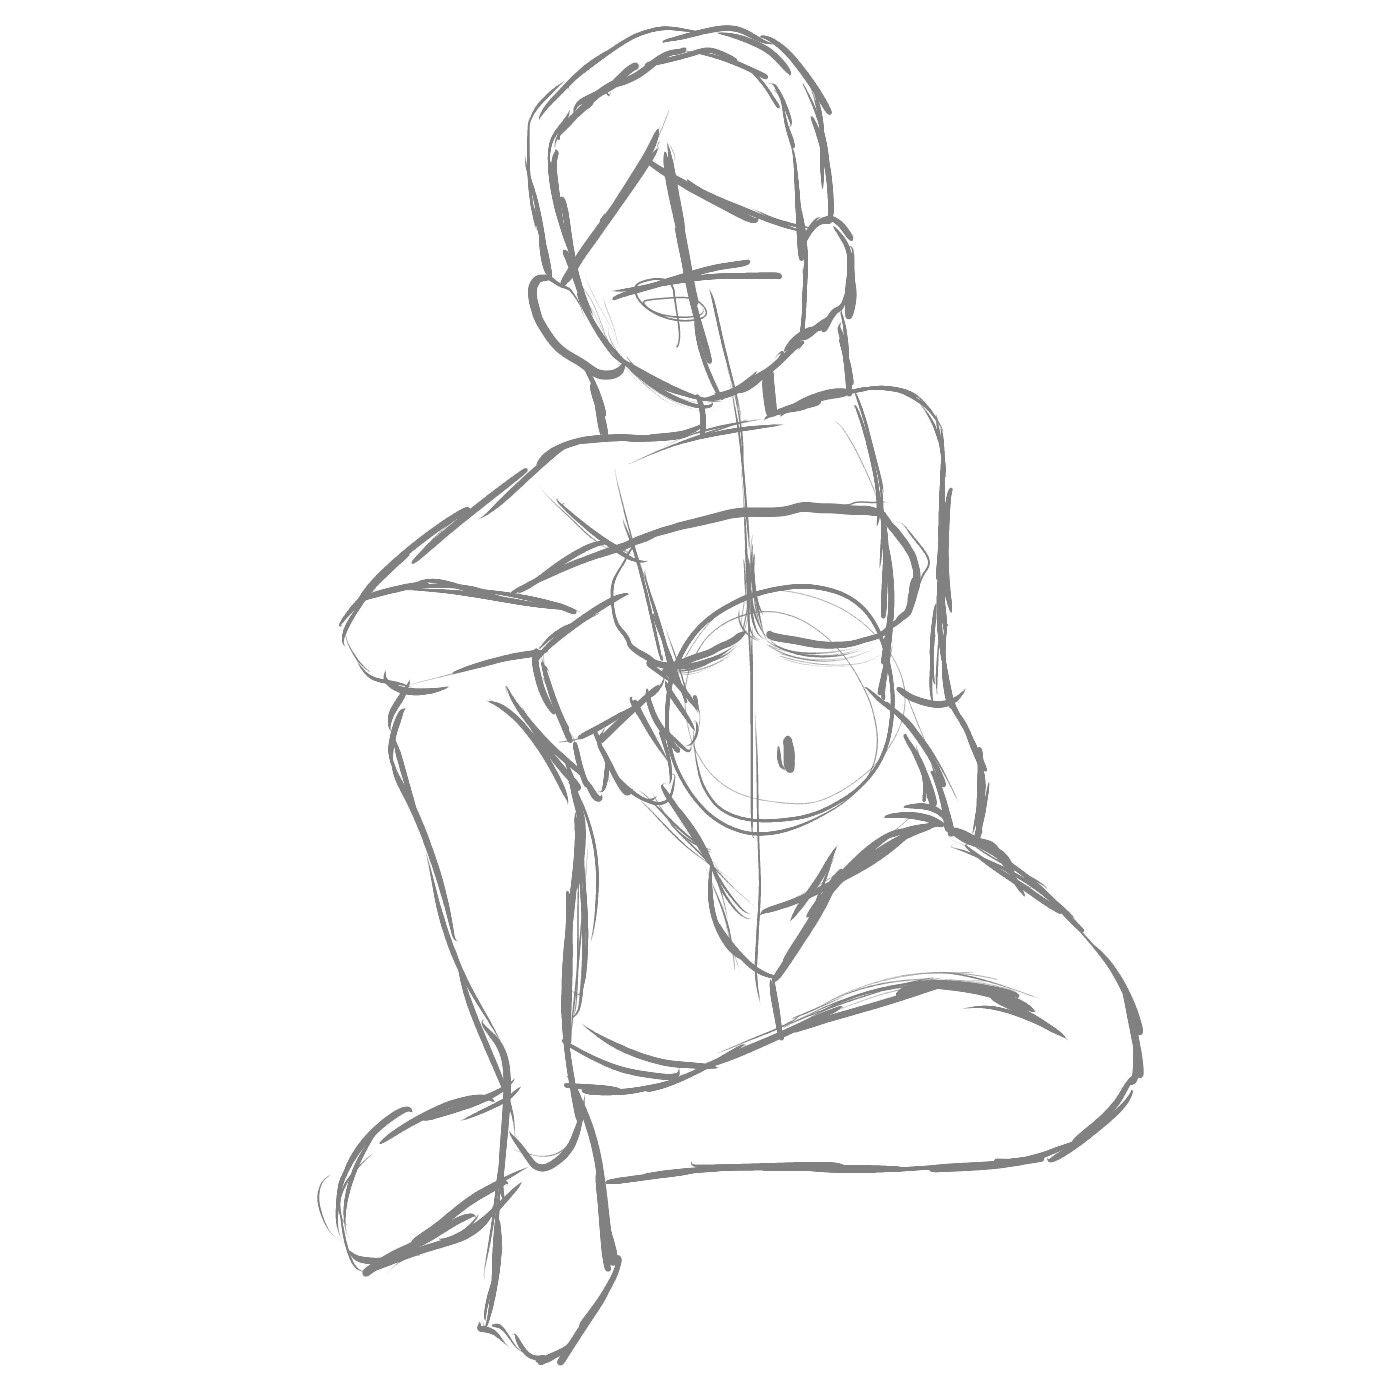 Digital Art Sketch Girl Sitting Drawing Art Line Art Body Drawing Art Sketches Drawing Base